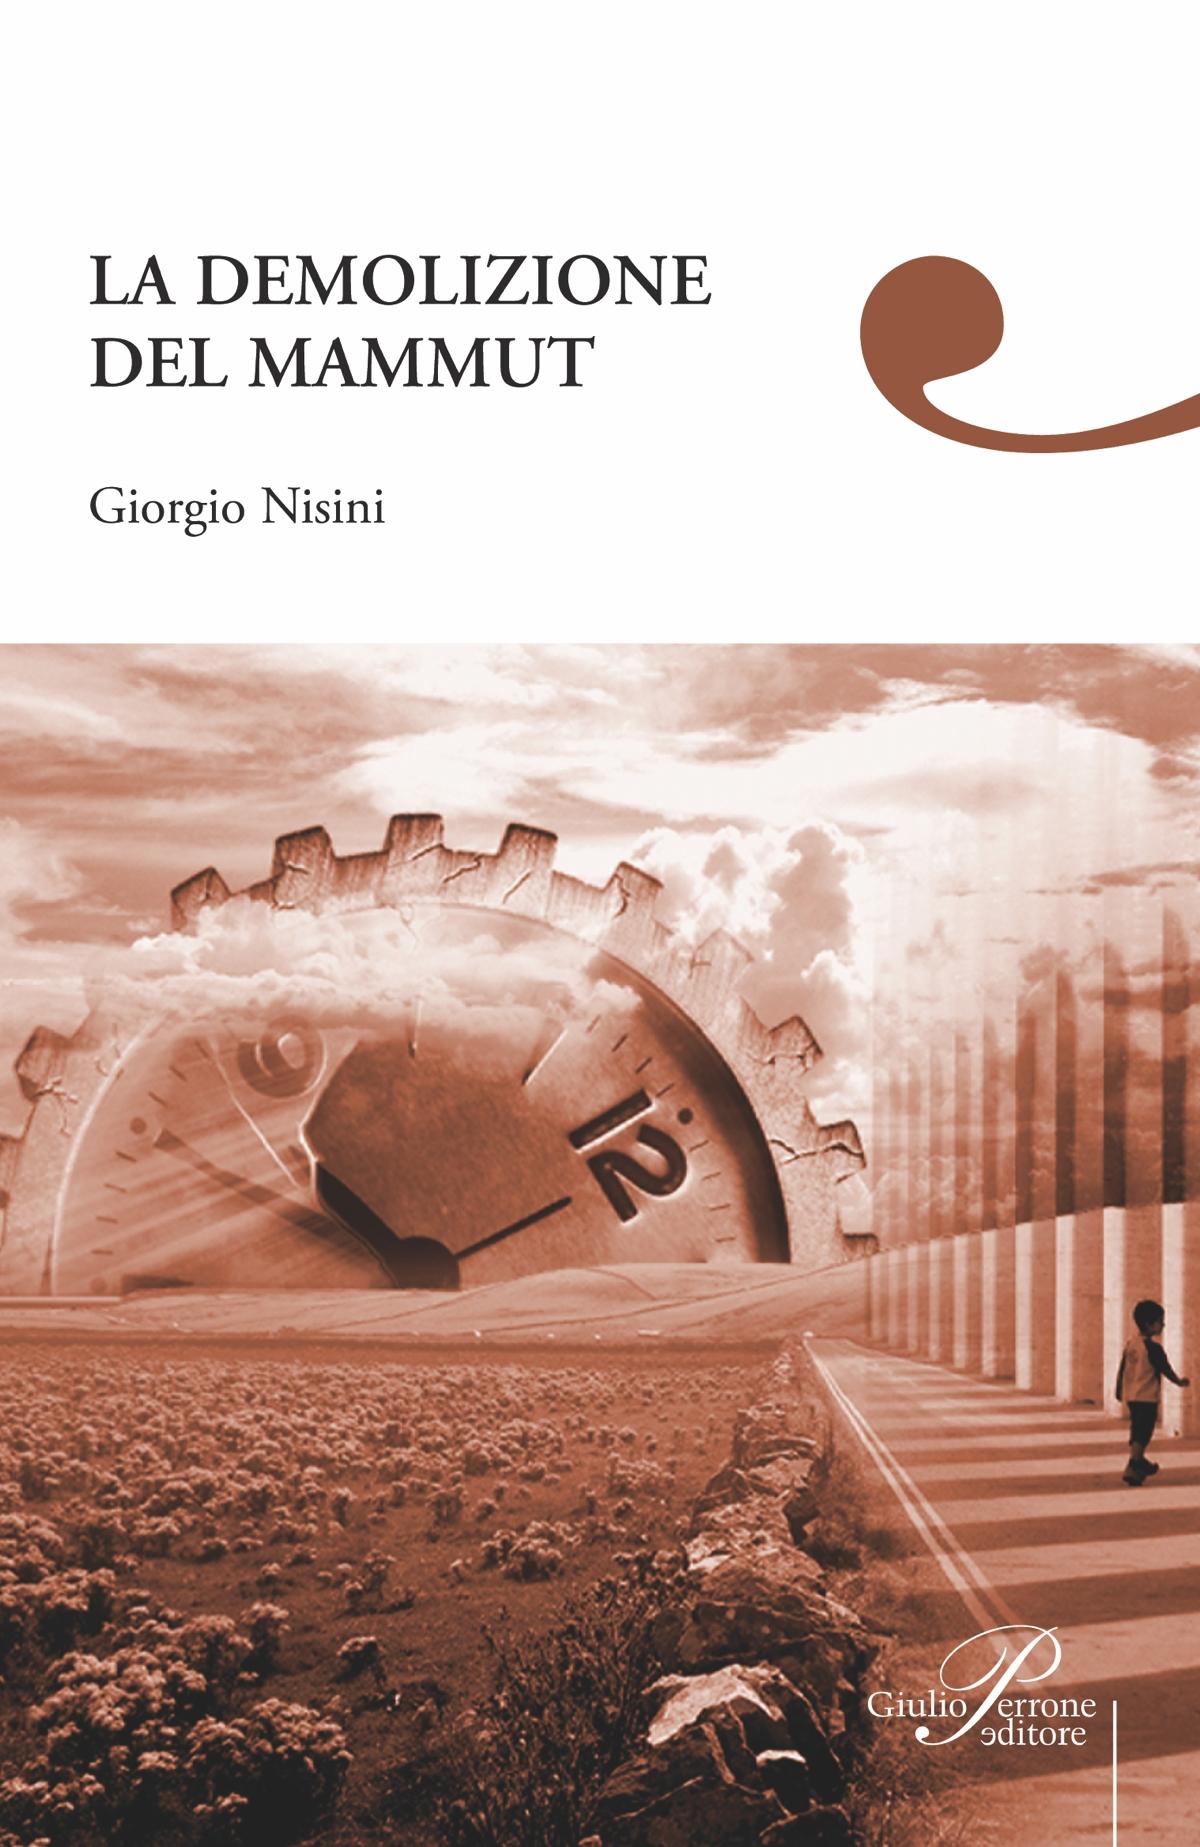 demolizione_mammut